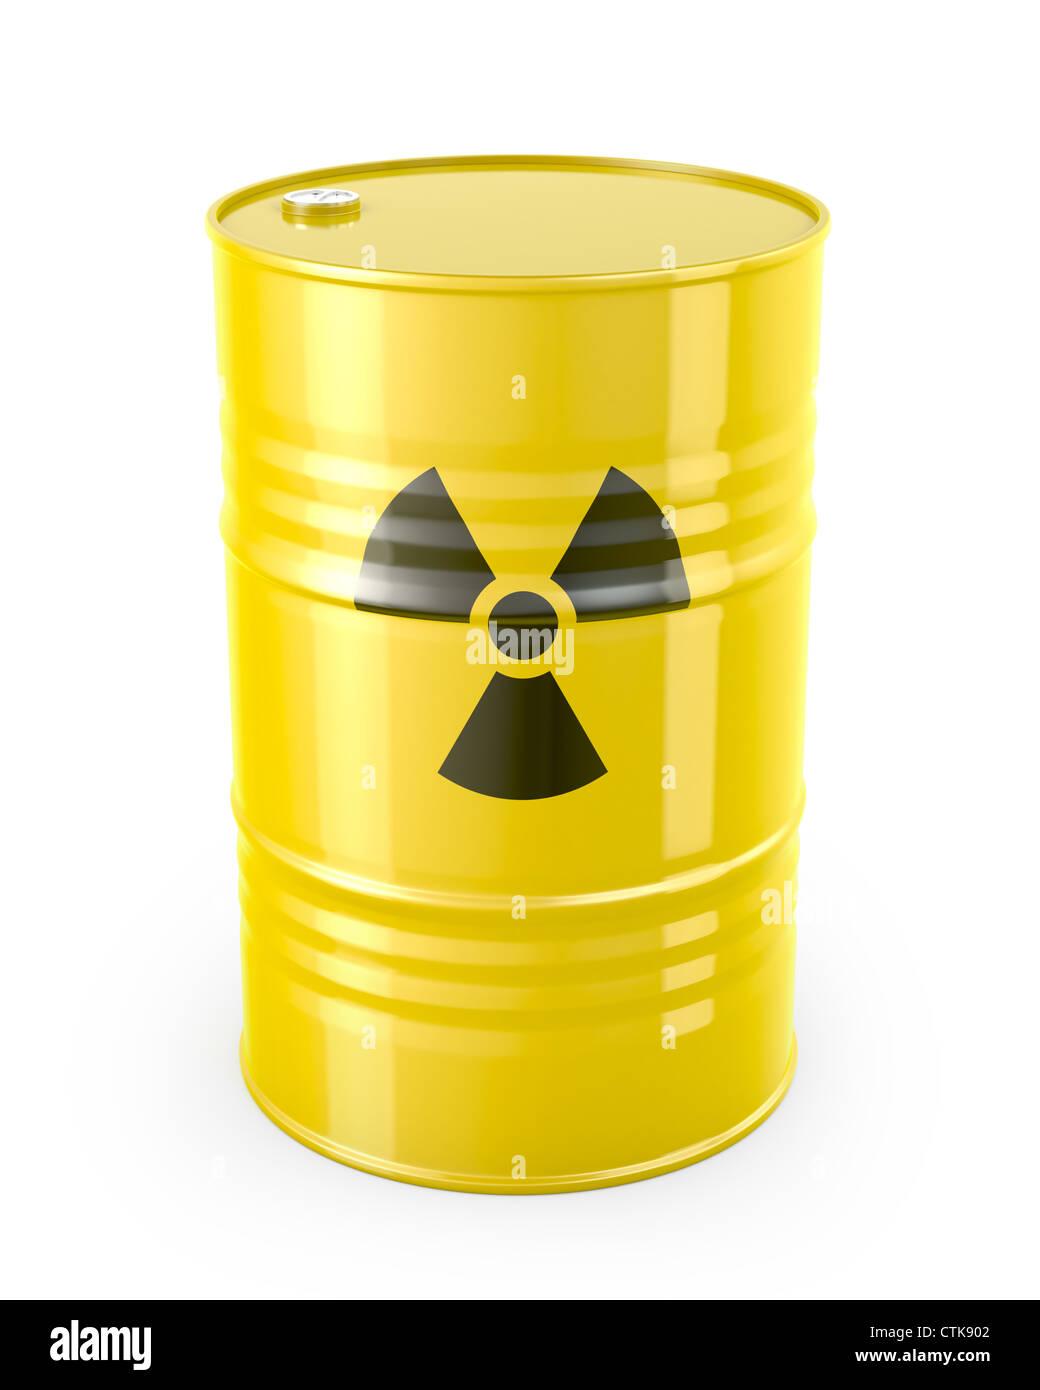 Nuclear Waste Disposal Symbol